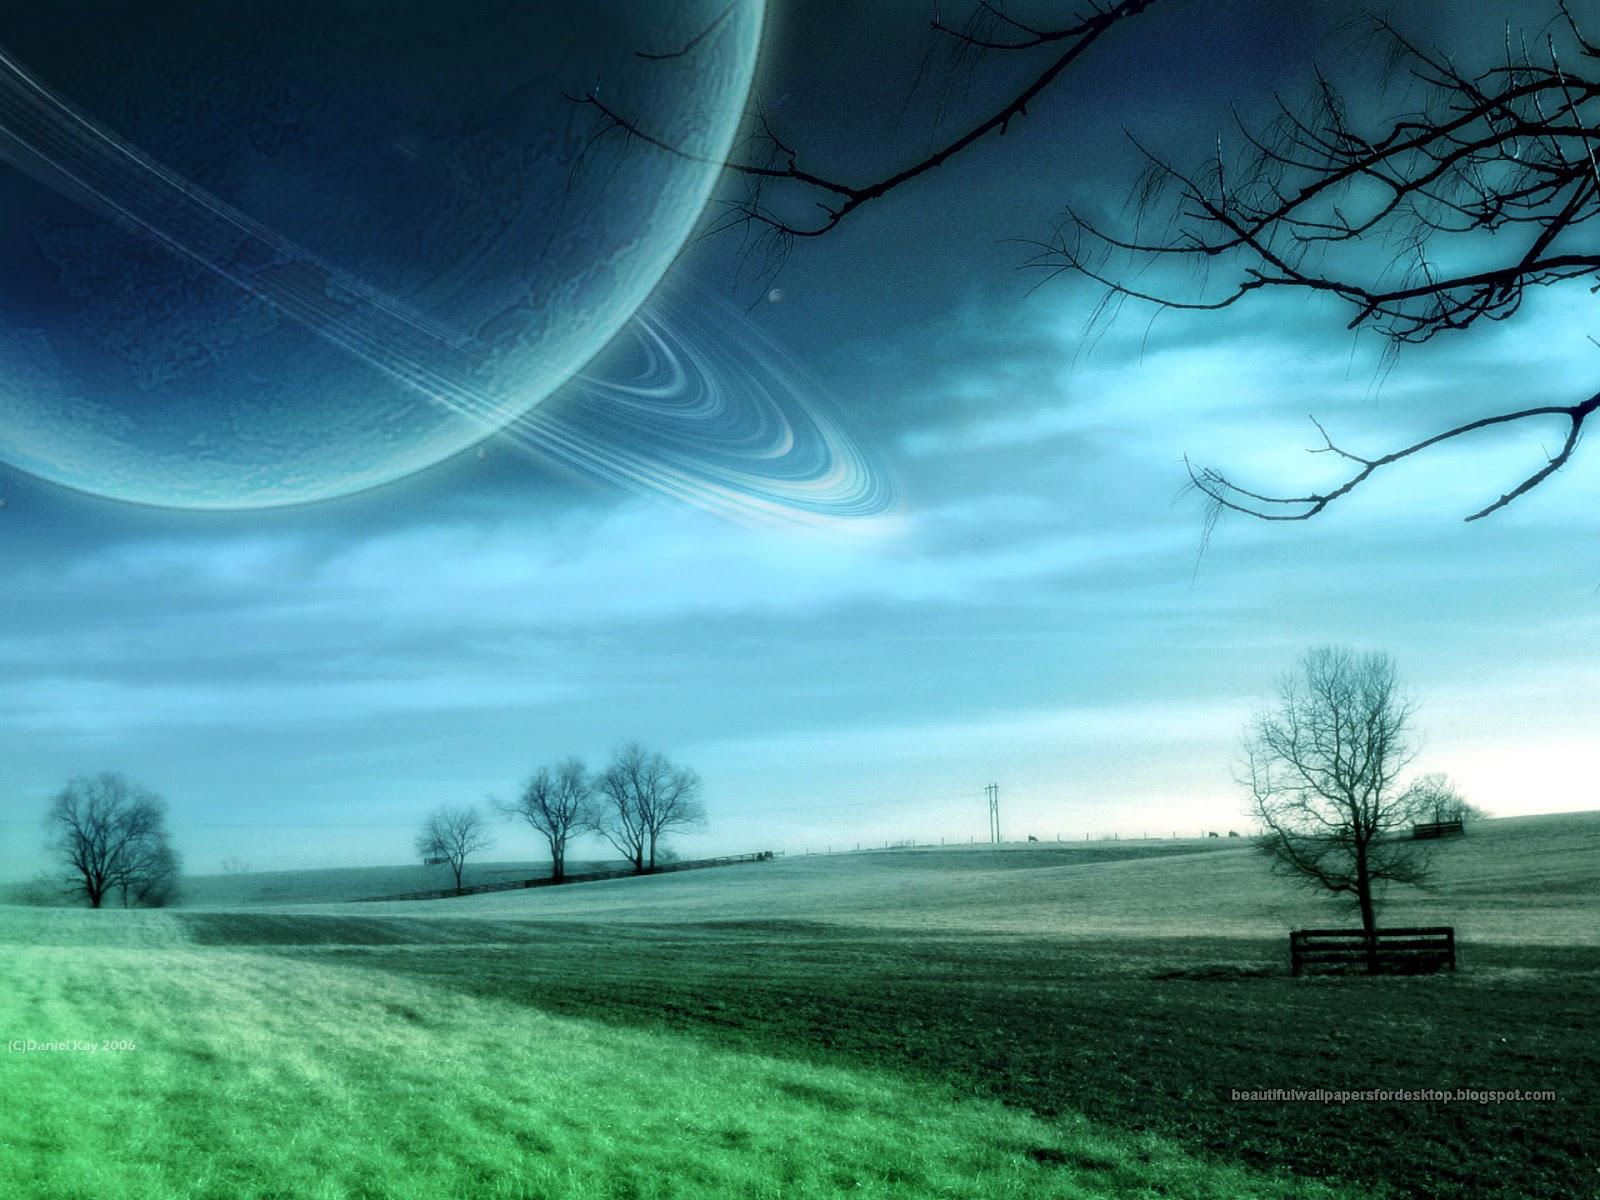 Beautiful Night Sky wallpaper 1600x1200